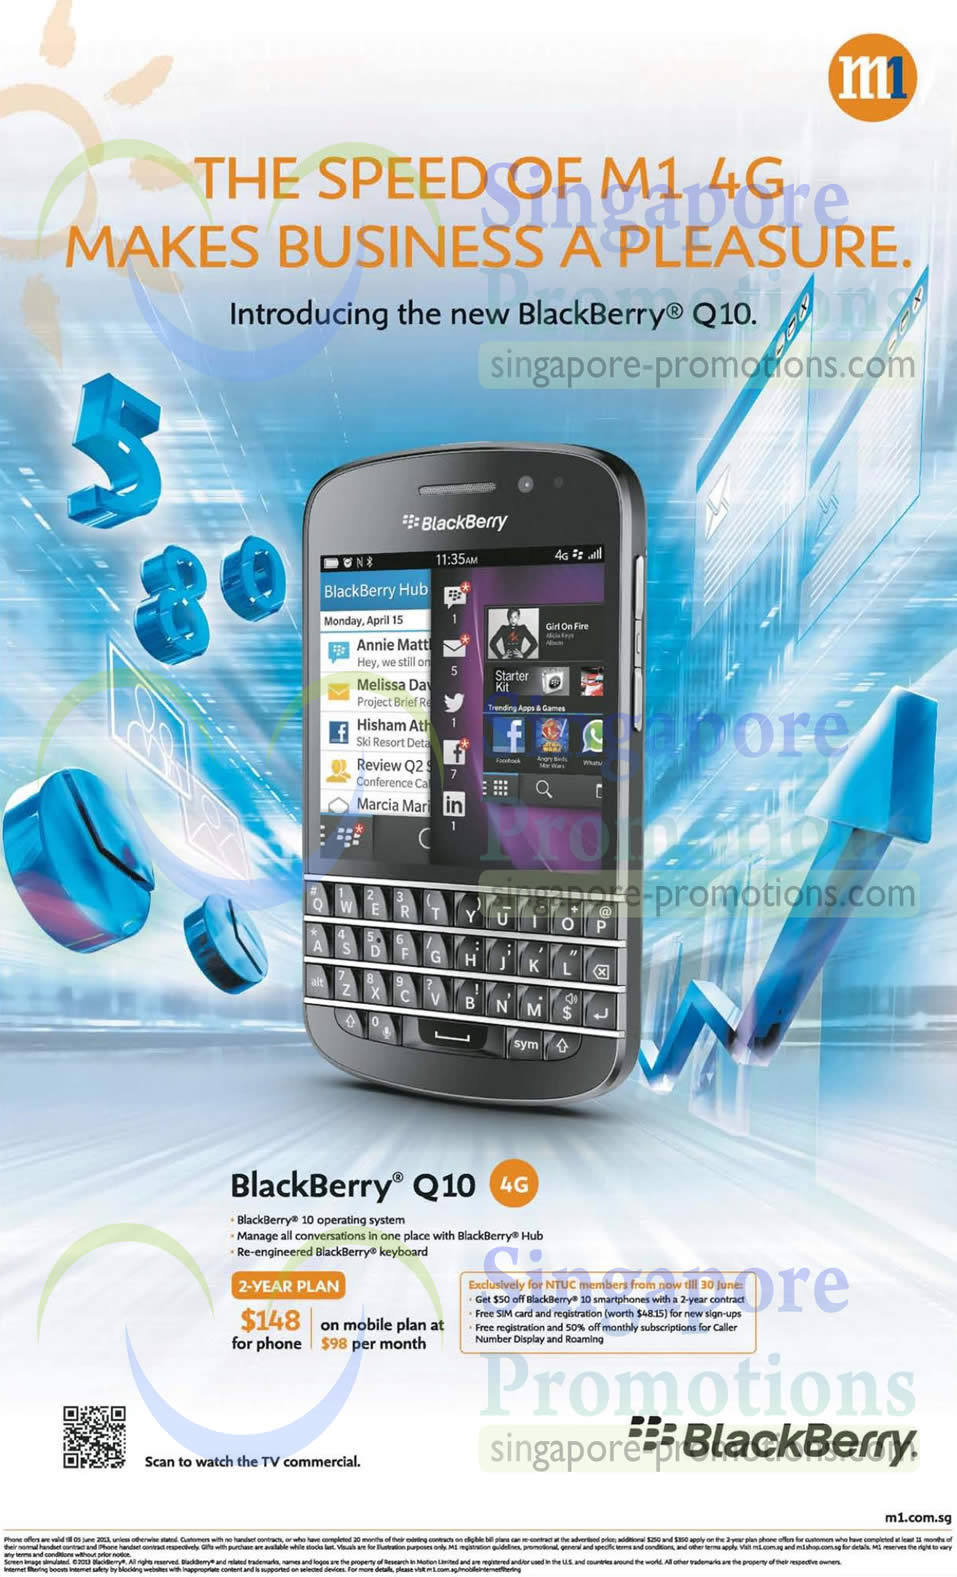 M1 Blackberry Q10